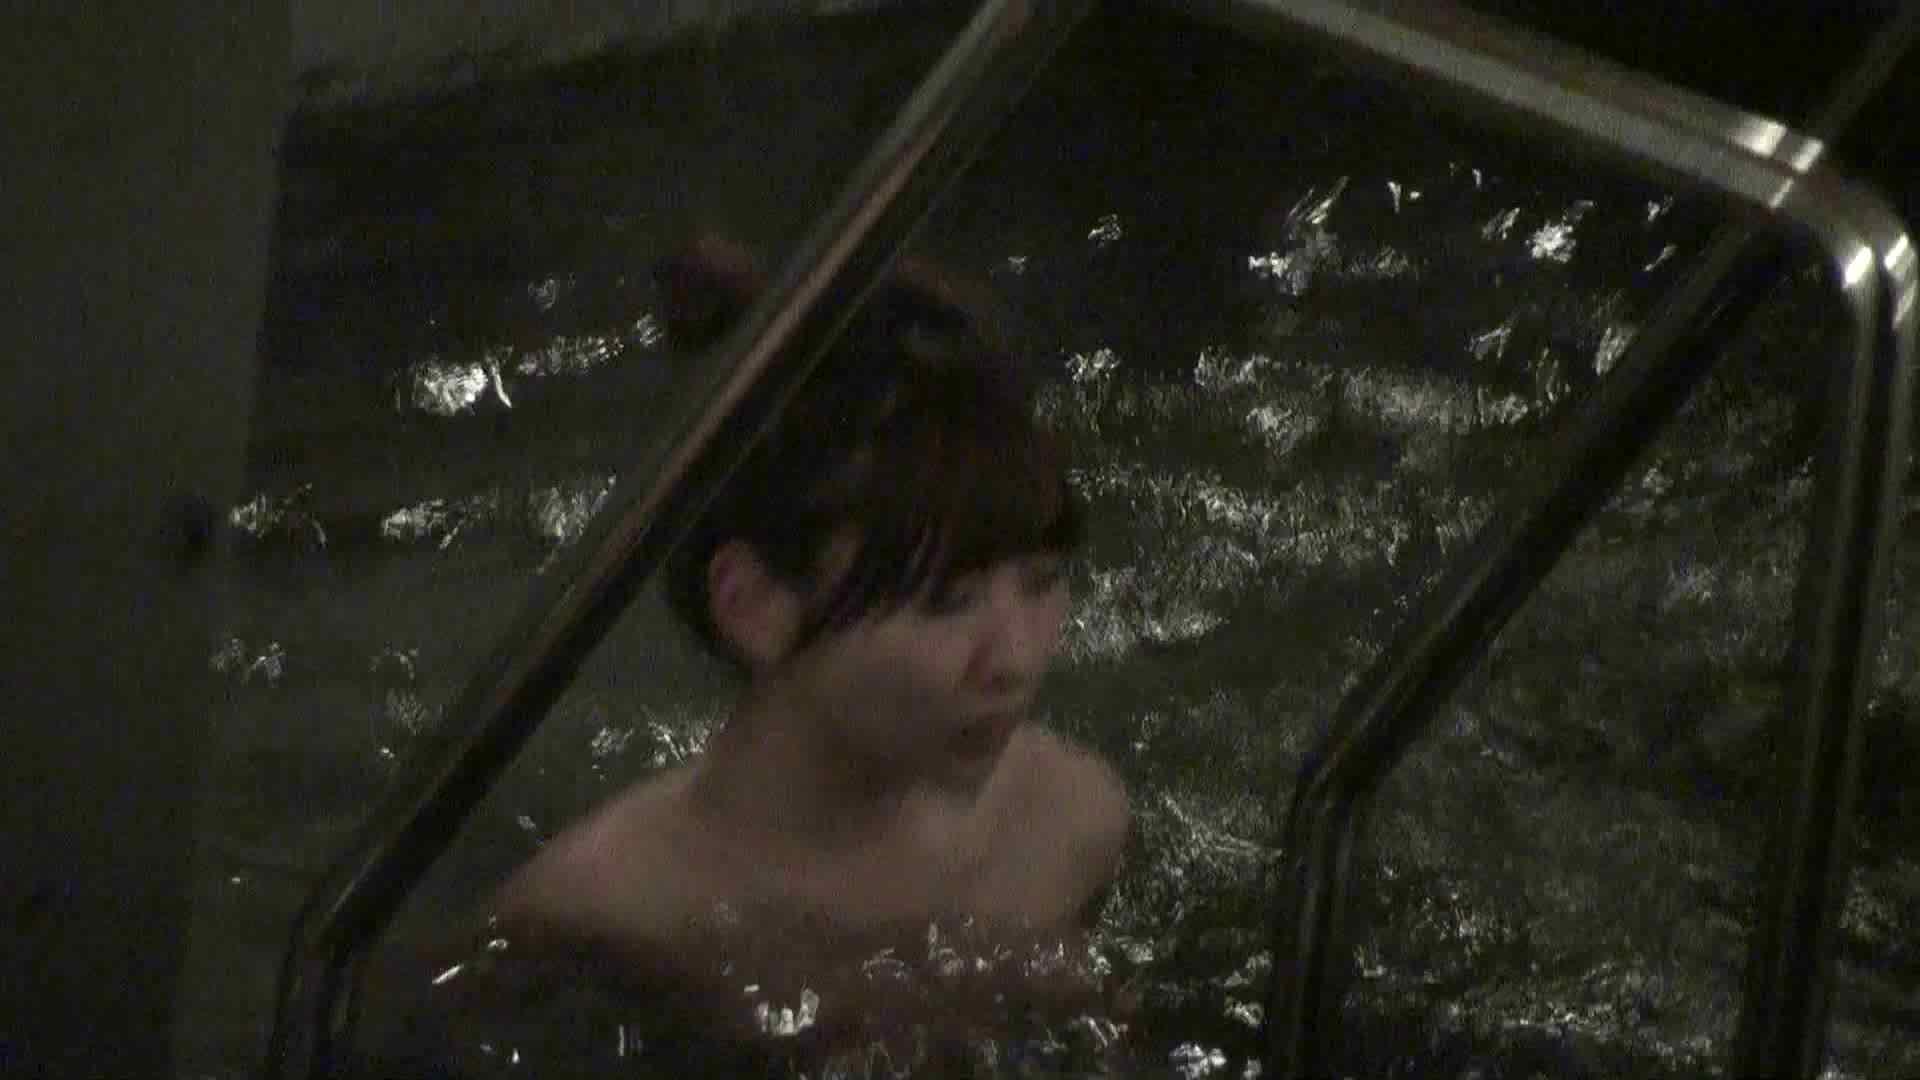 Aquaな露天風呂Vol.410 盗撮  73連発 68